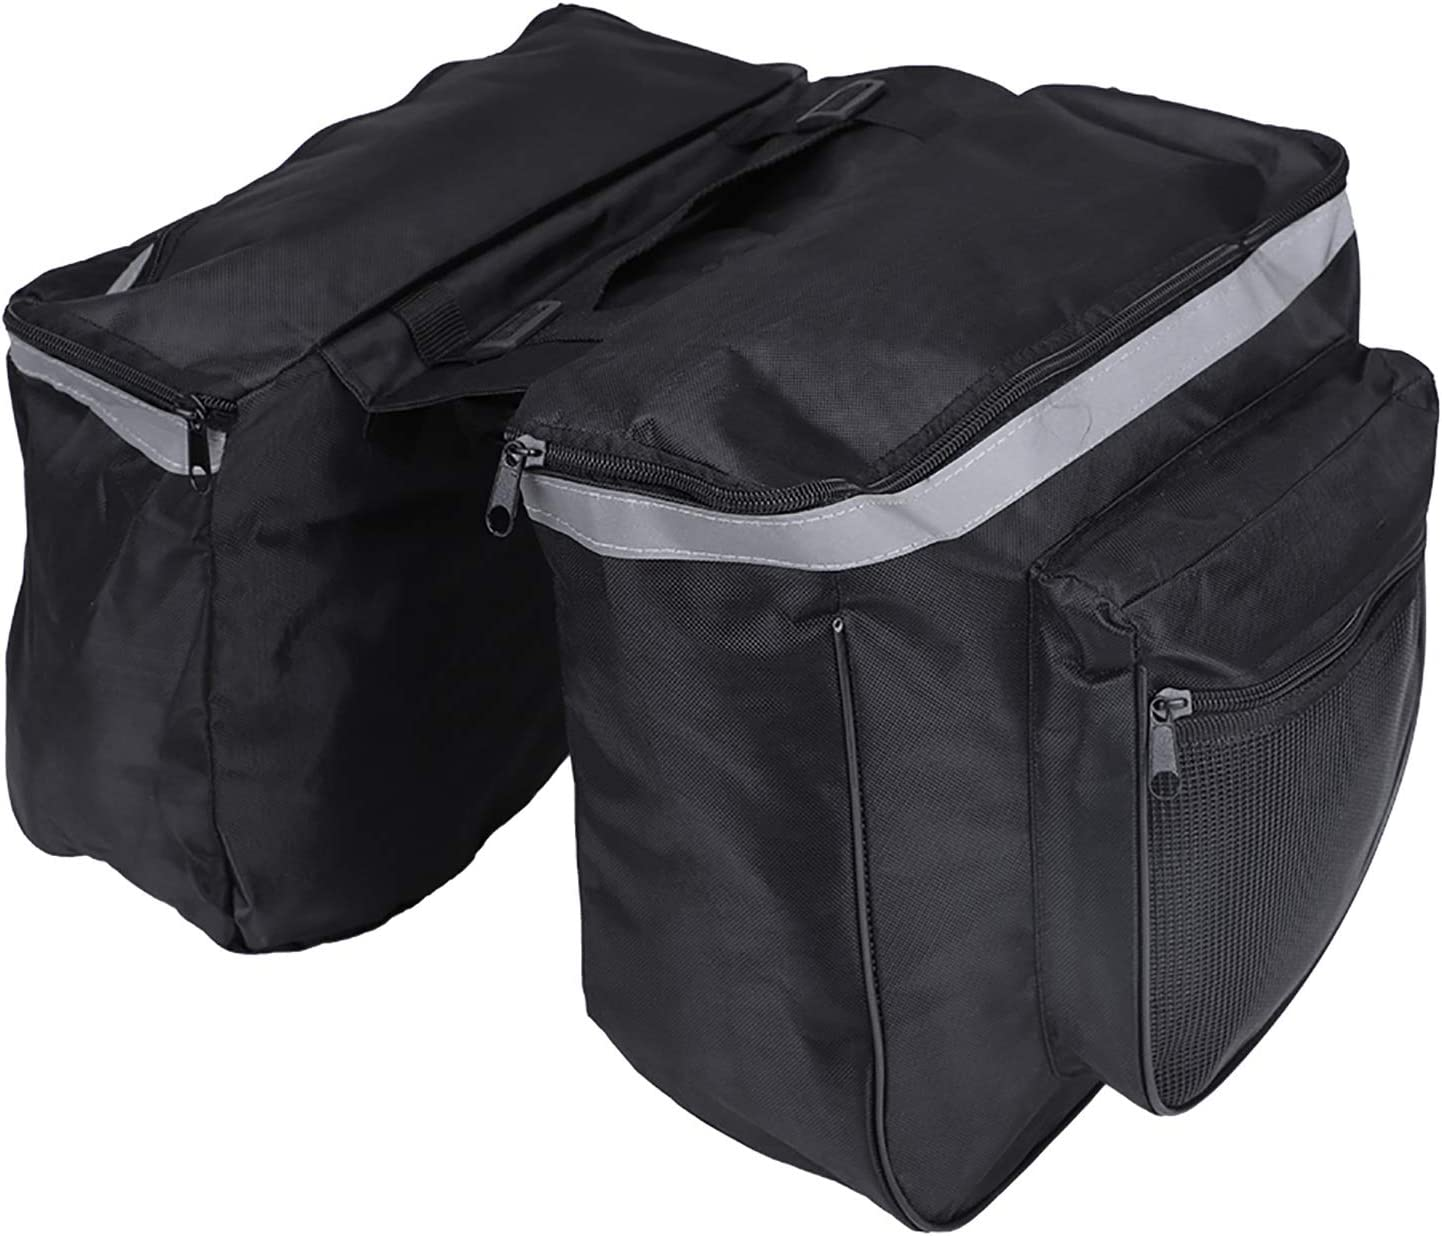 Kuuleyn Bike Pannier Bags 25L Deluxe Waterproof SEAL limited product Carrier Rear Bag M